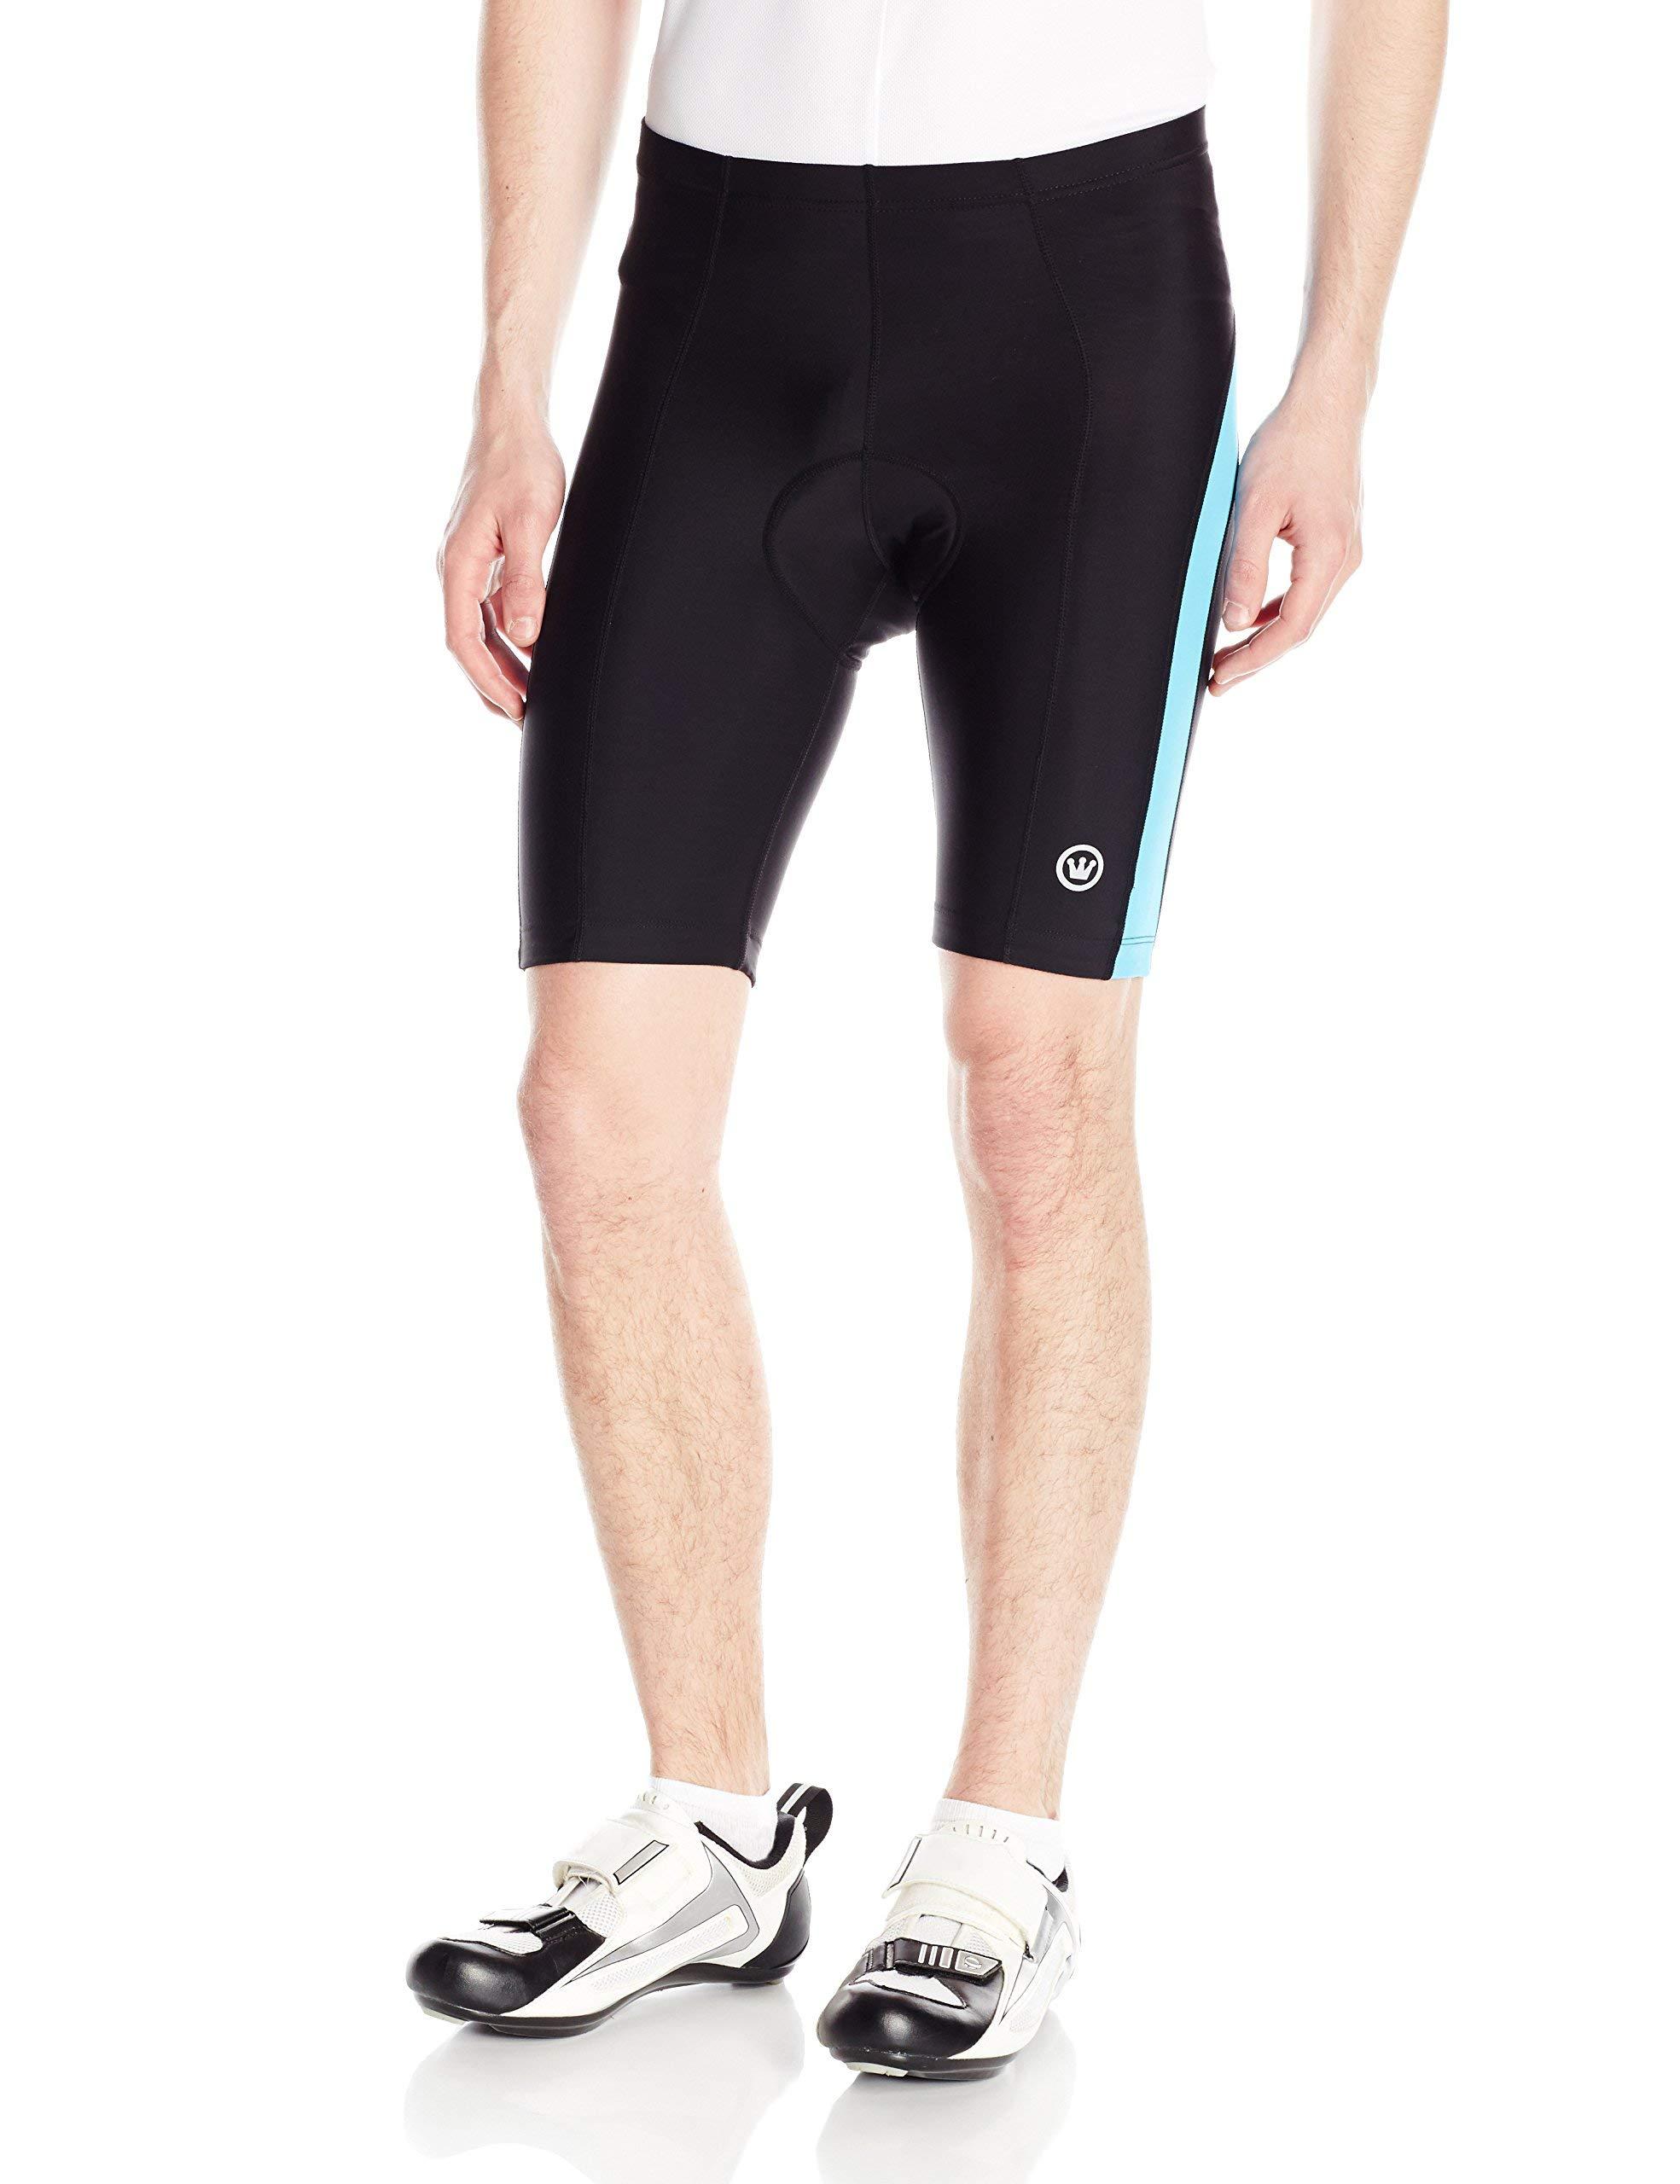 CANARI Men's Blade Gel Shorts, Neon Electric Blue, Large